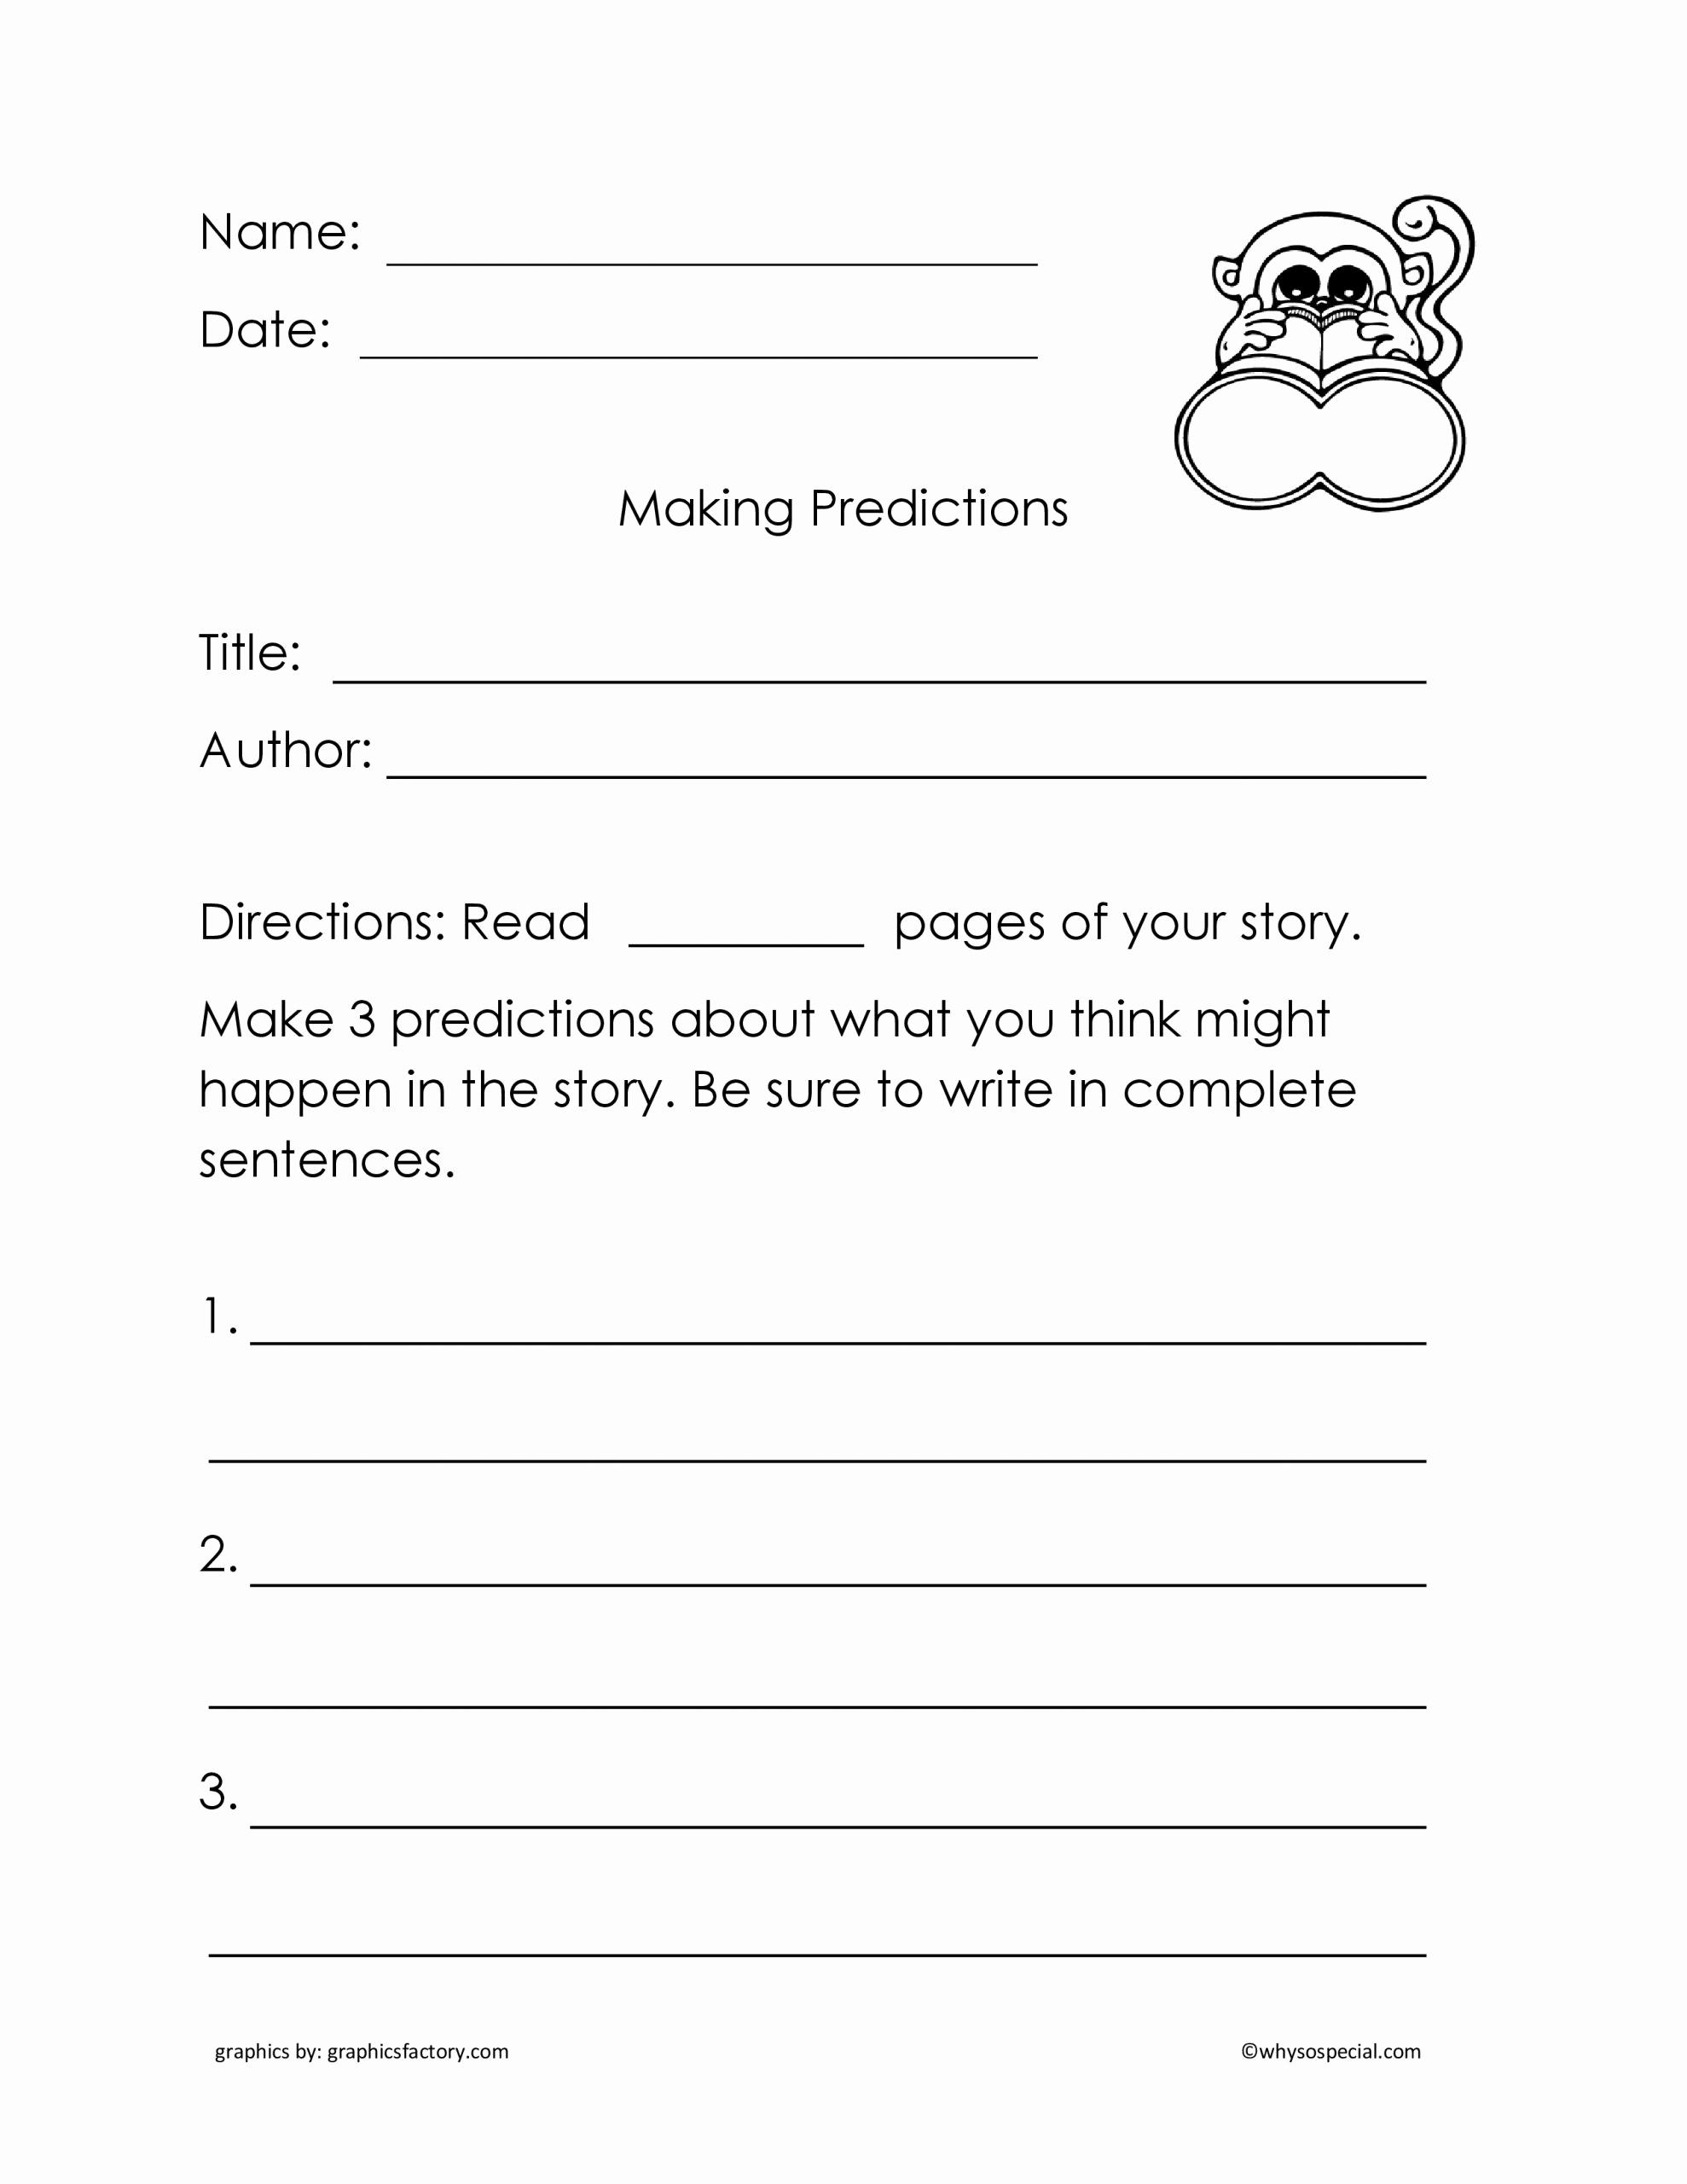 Prediction Worksheets for 3rd Grade Lovely Making Predictions Worksheets 3rd Grade